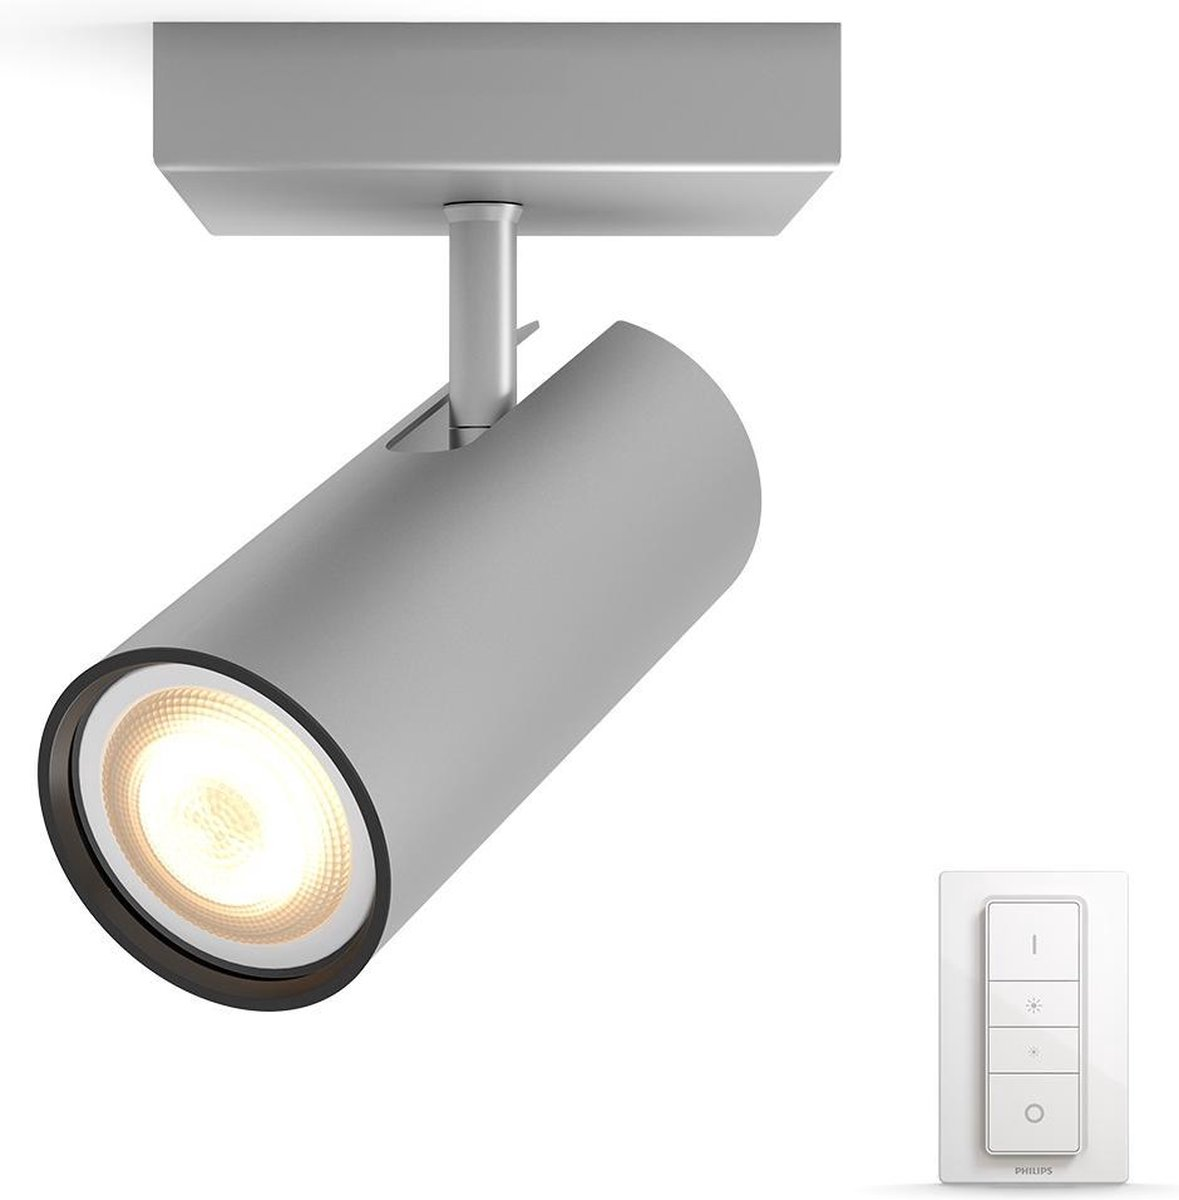 Philips Hue Buratto - Opbouwspot - 1 lichtpunt - aluminium - incl DIM switch